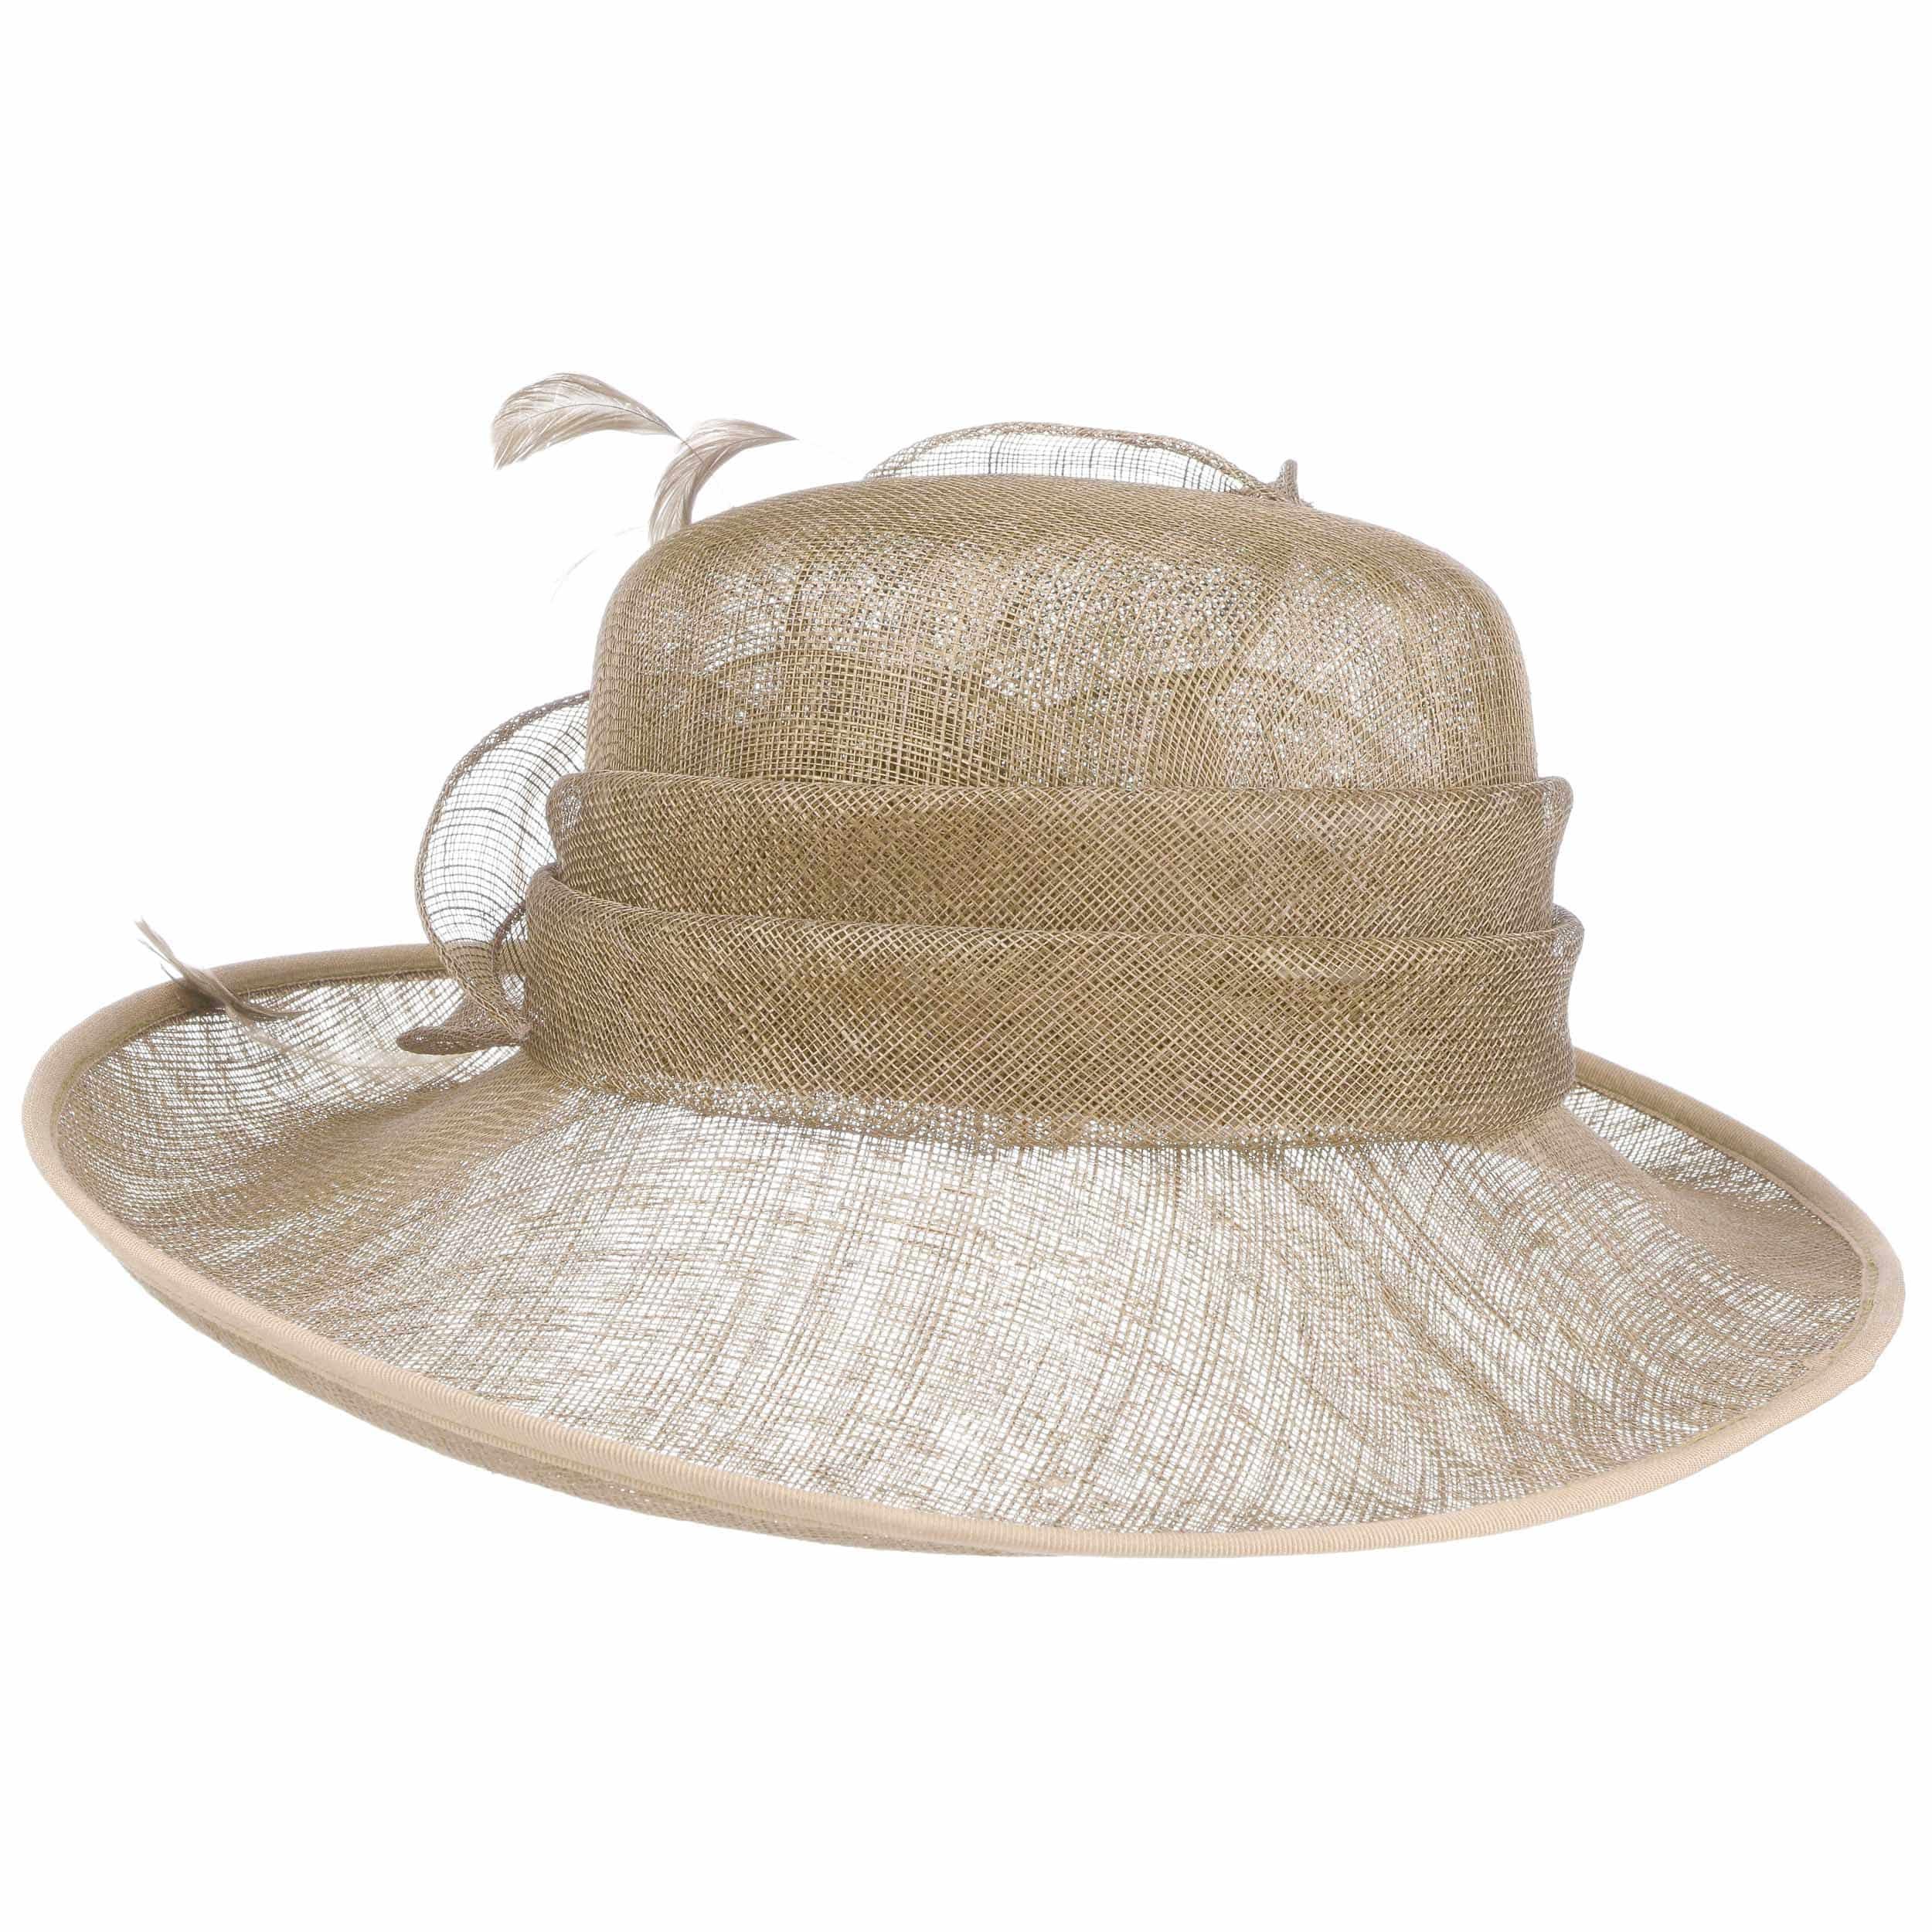 ... Cappello da Donna Clare Sinamay by Lierys - marrone 3 ... 3c7039a905bc